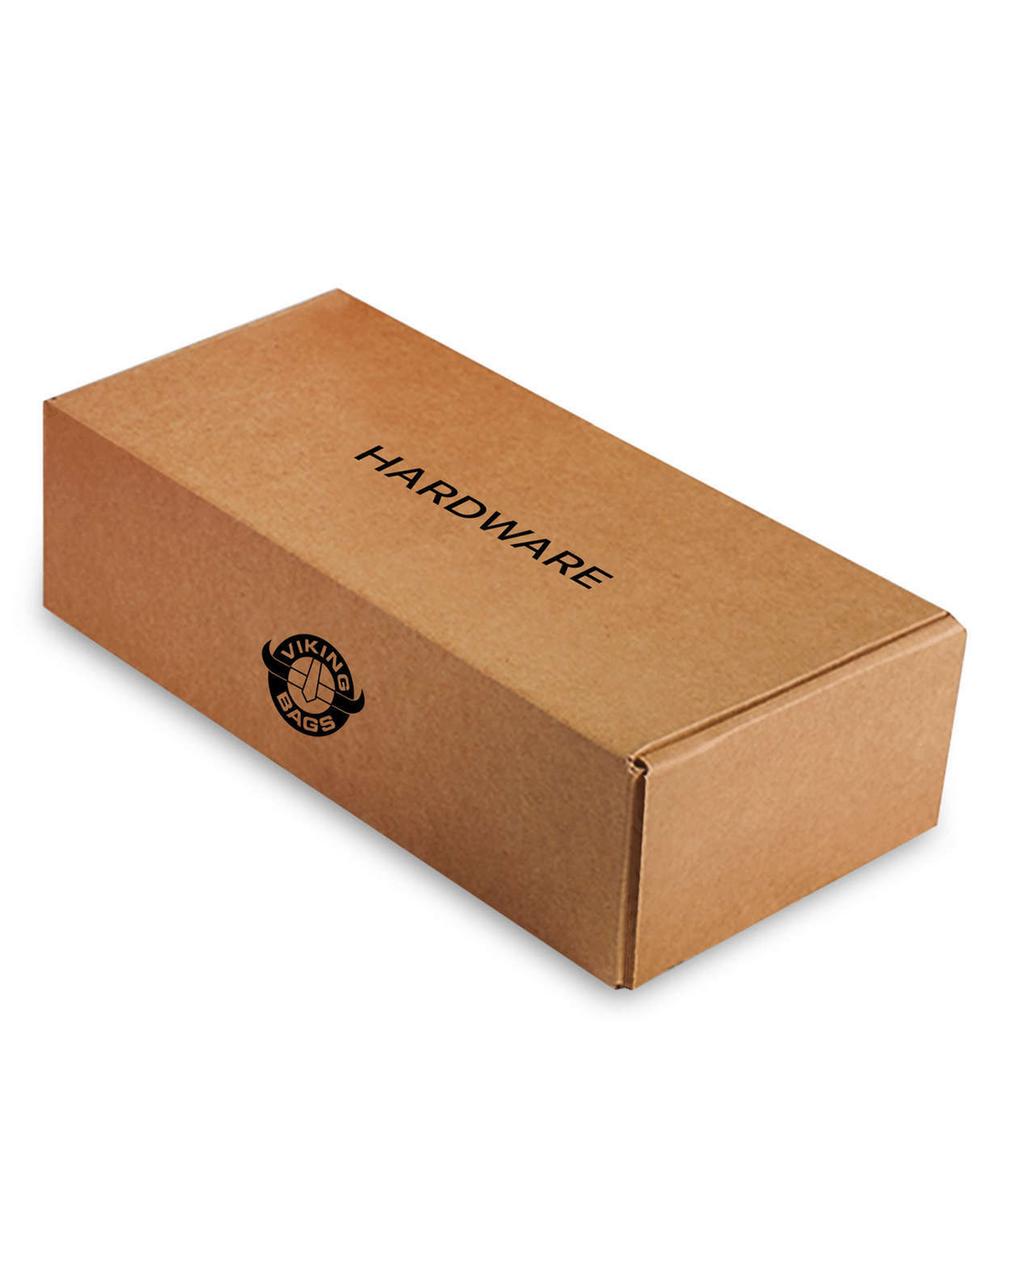 Victory Boardwalk Pinnacle Motorcycle Saddlebags  Hardware Box